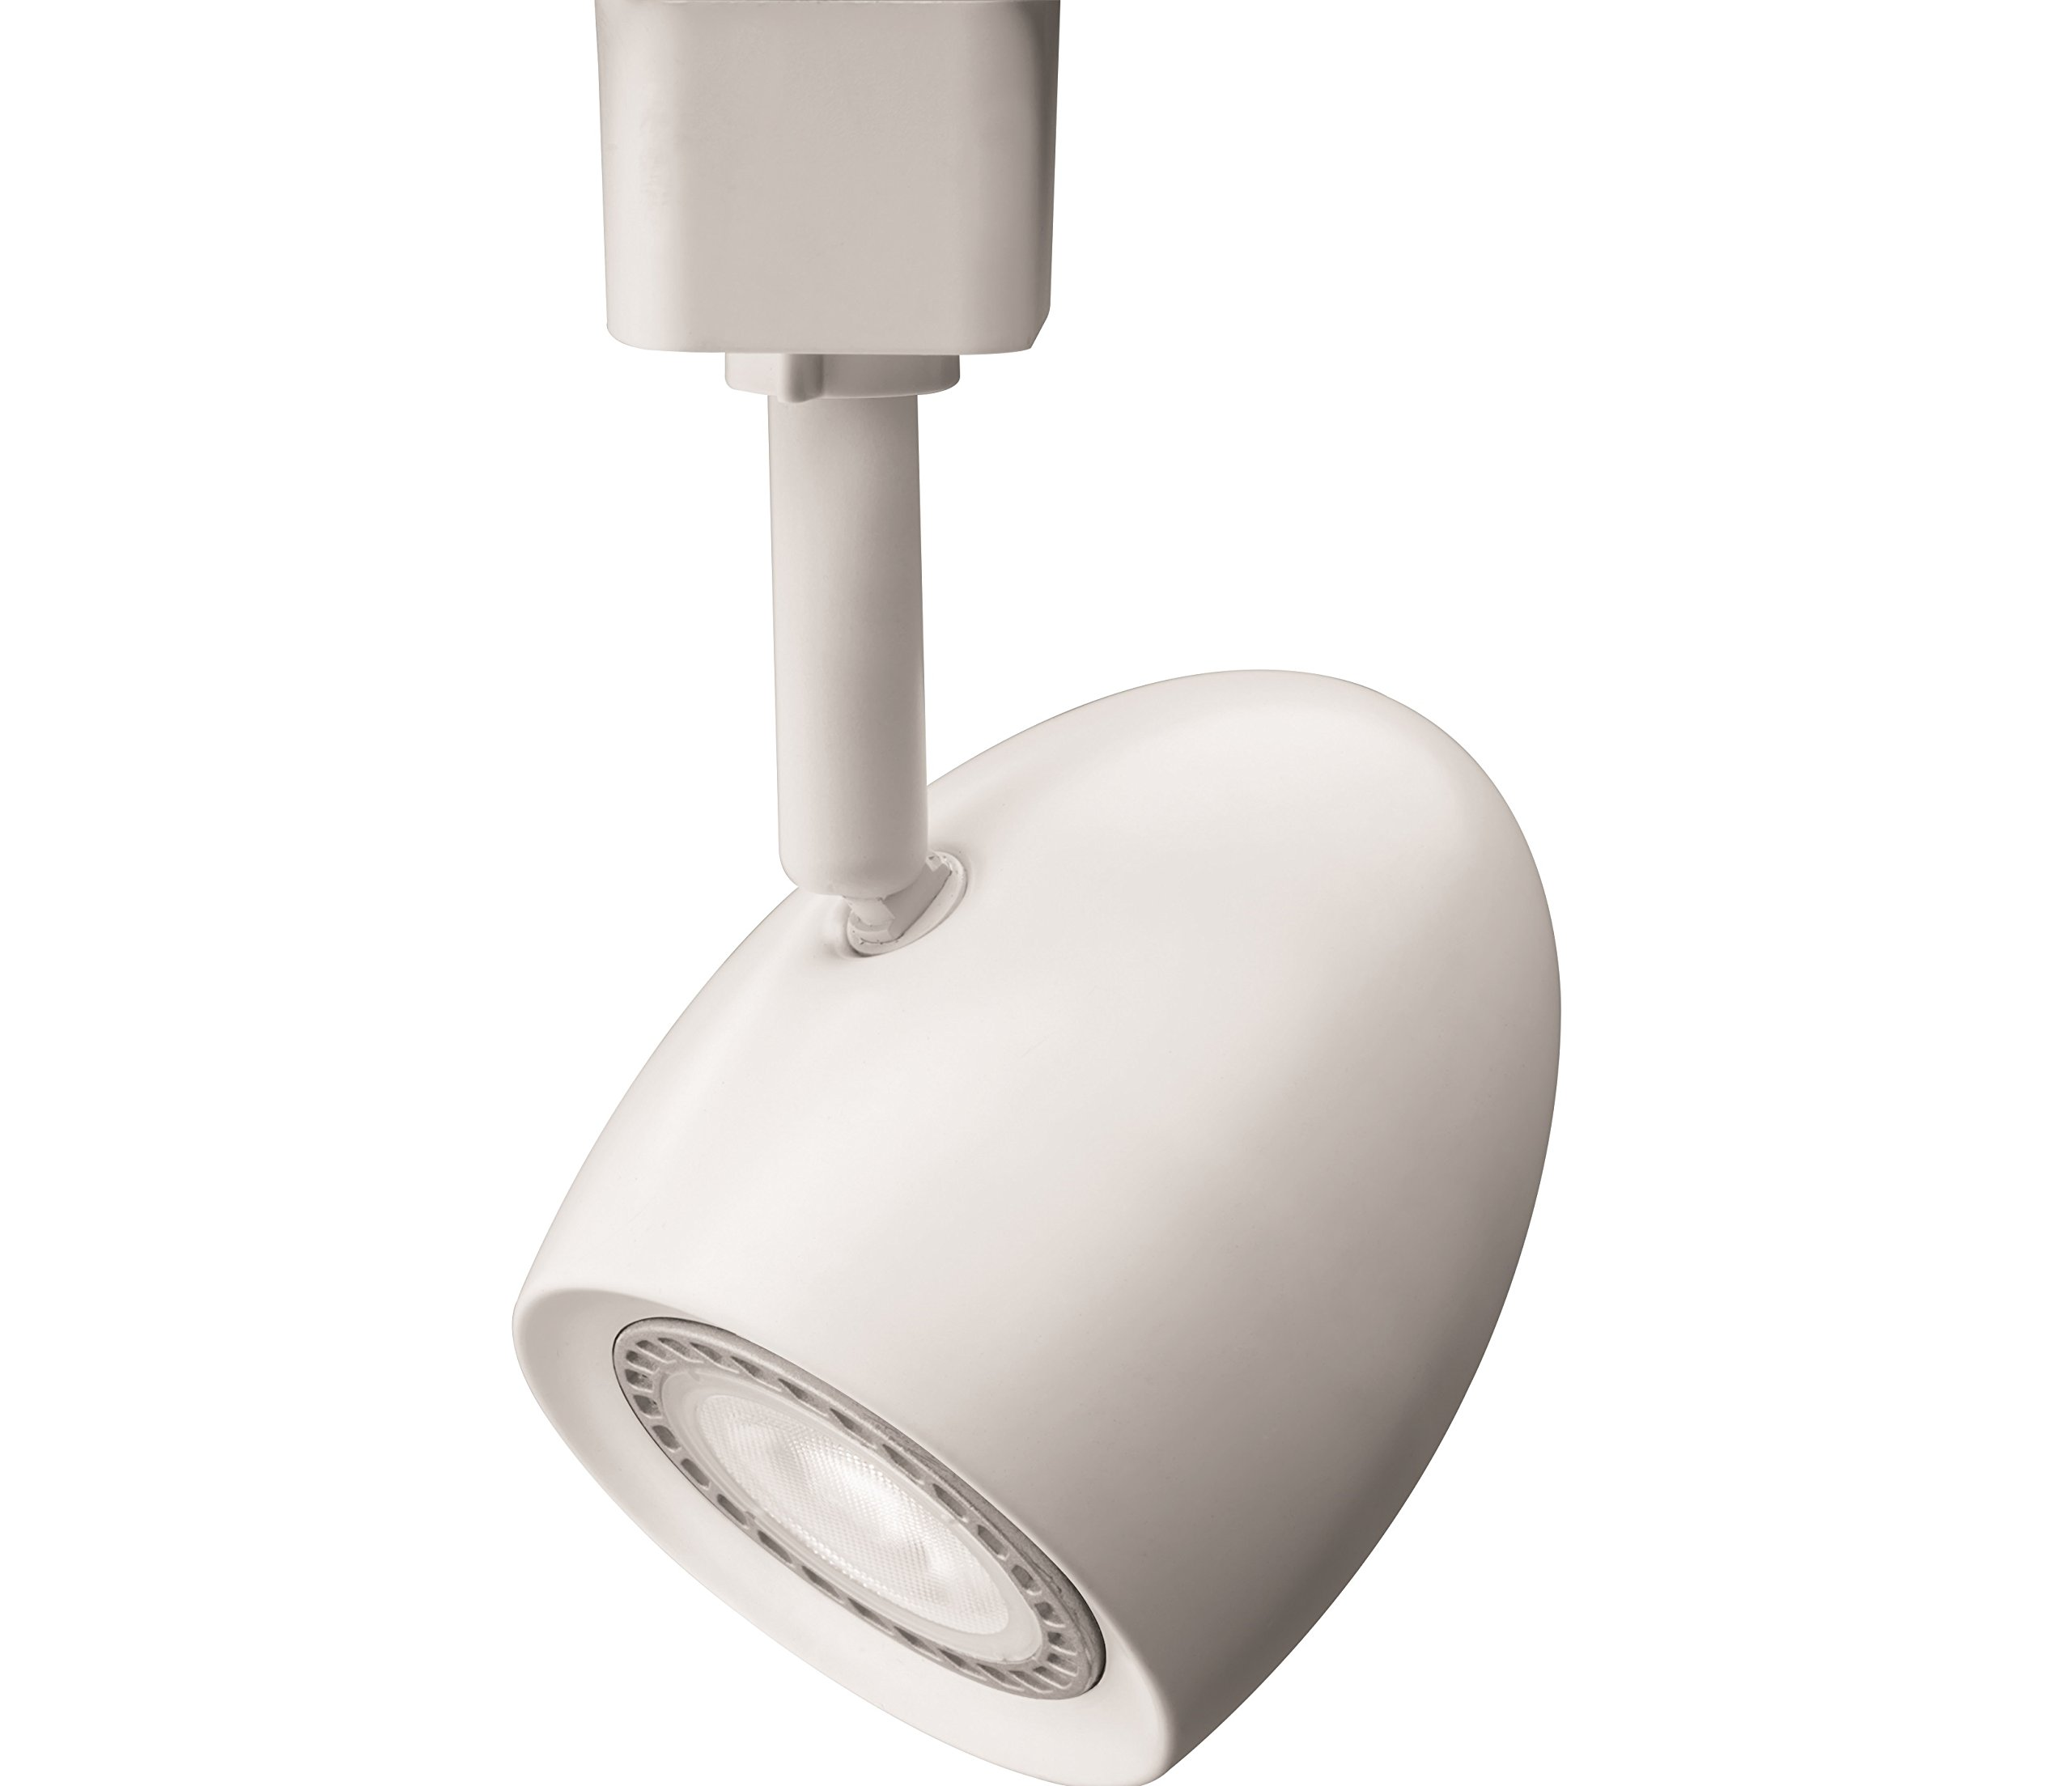 Lithonia Lighting LTHOVAL MR16GU10 LED 27K MW M4 LED Lamp Oval Track Head, Matte White